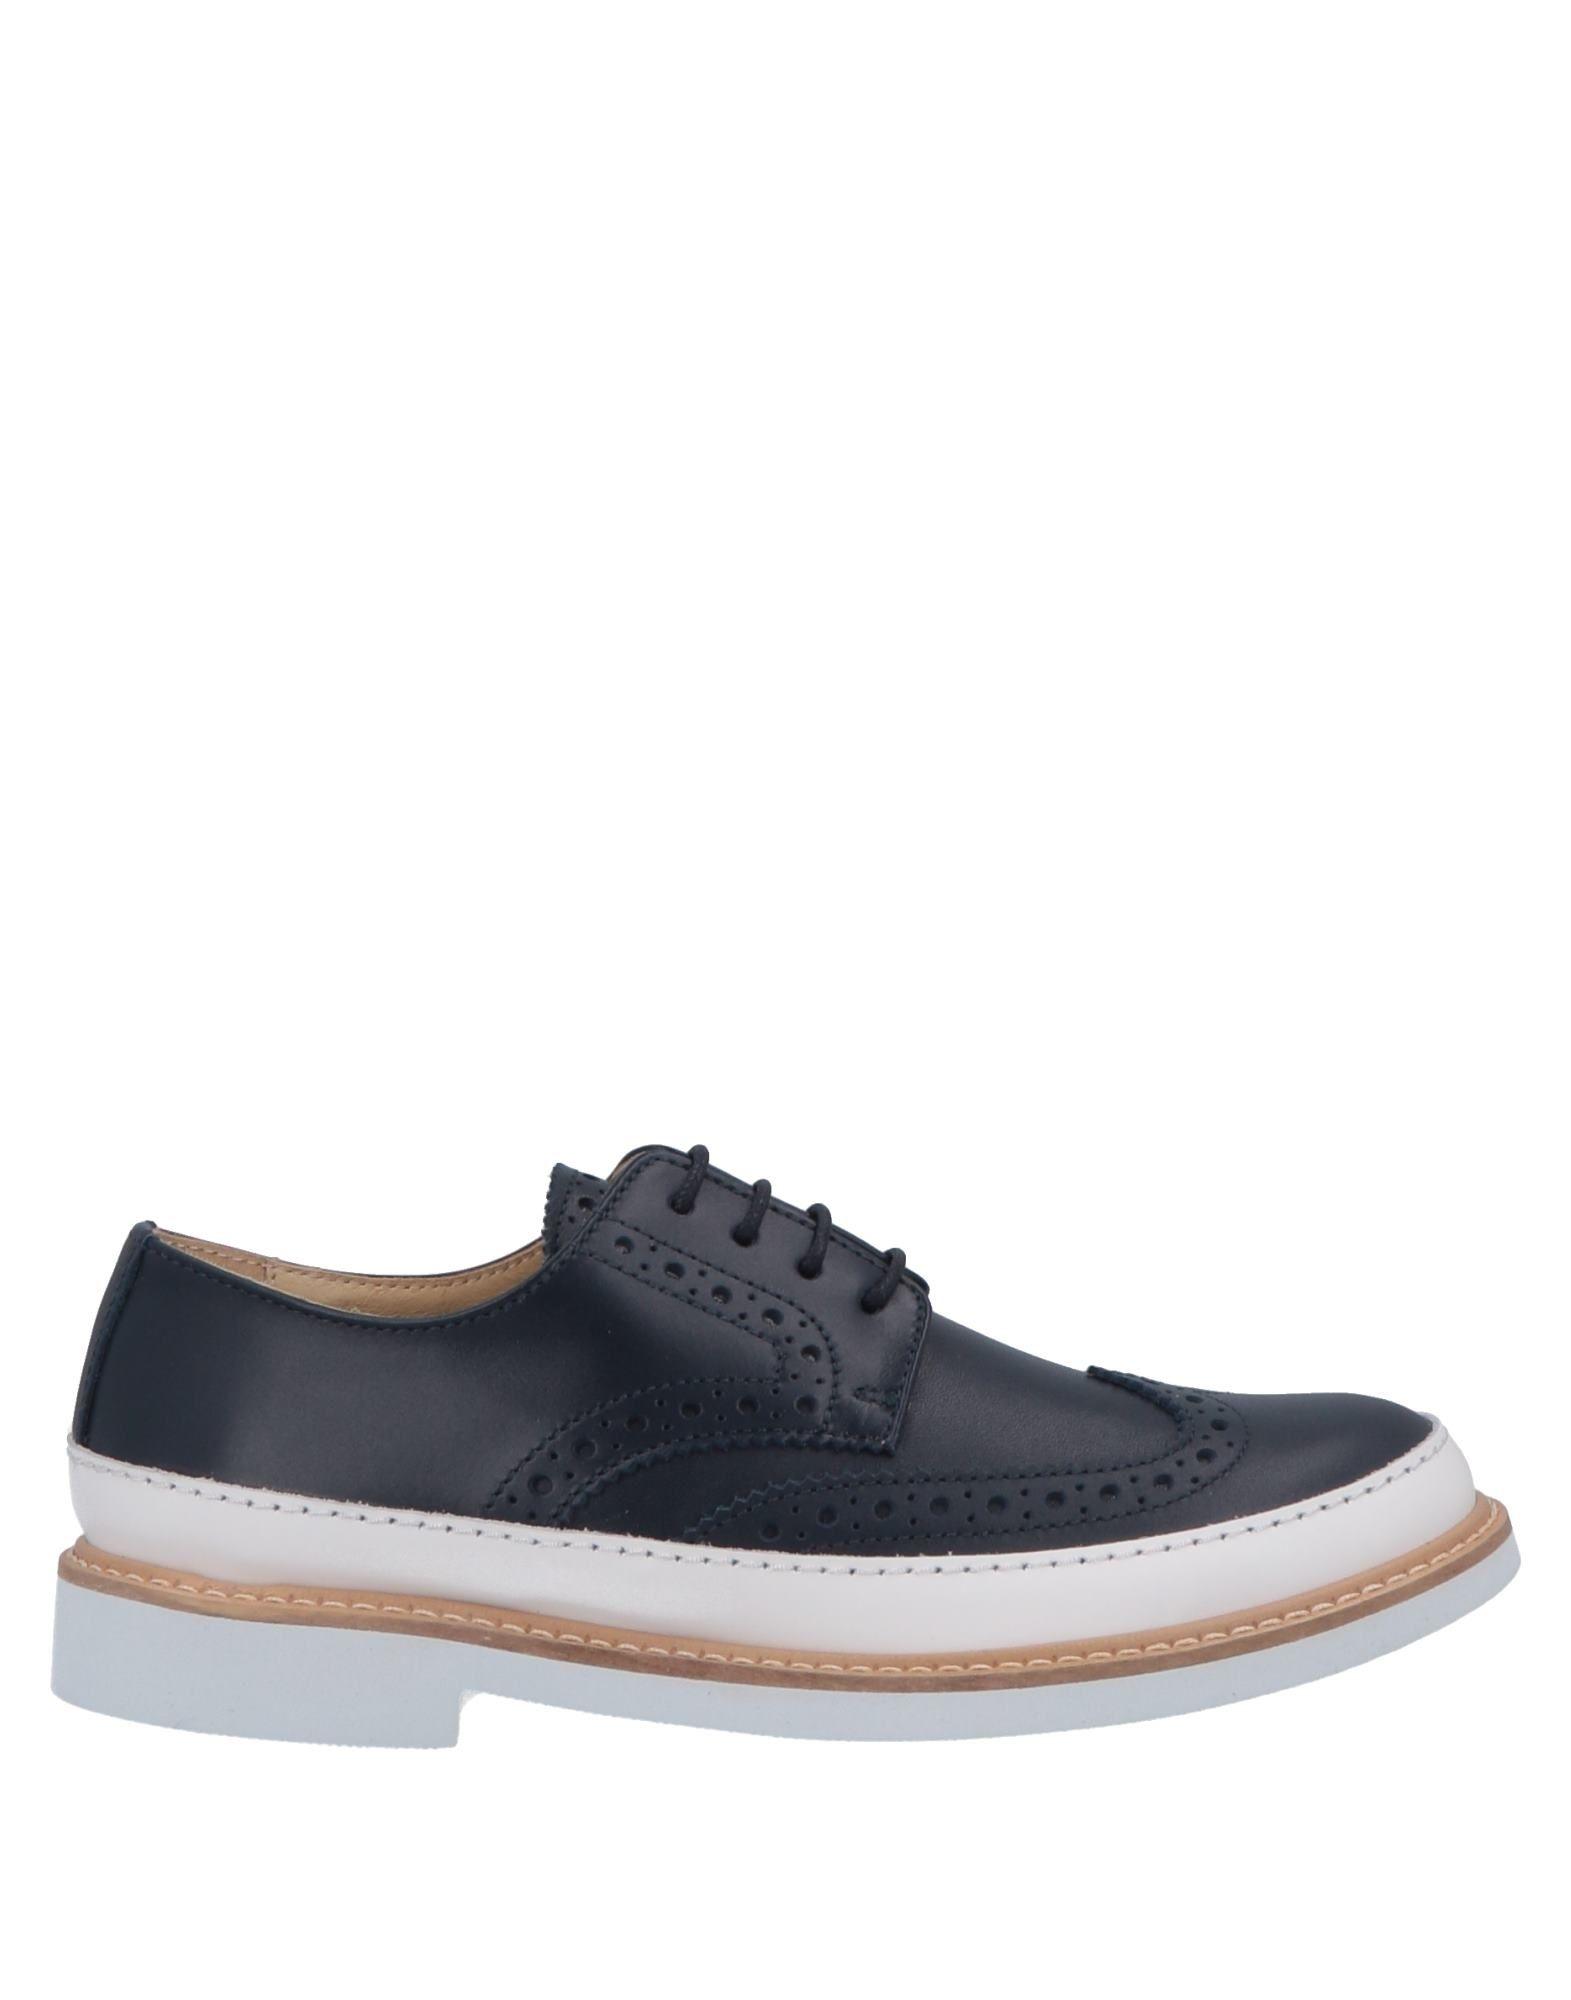 Фото - MONTELPARE TRADITION Обувь на шнурках обувь на высокой платформе dkny